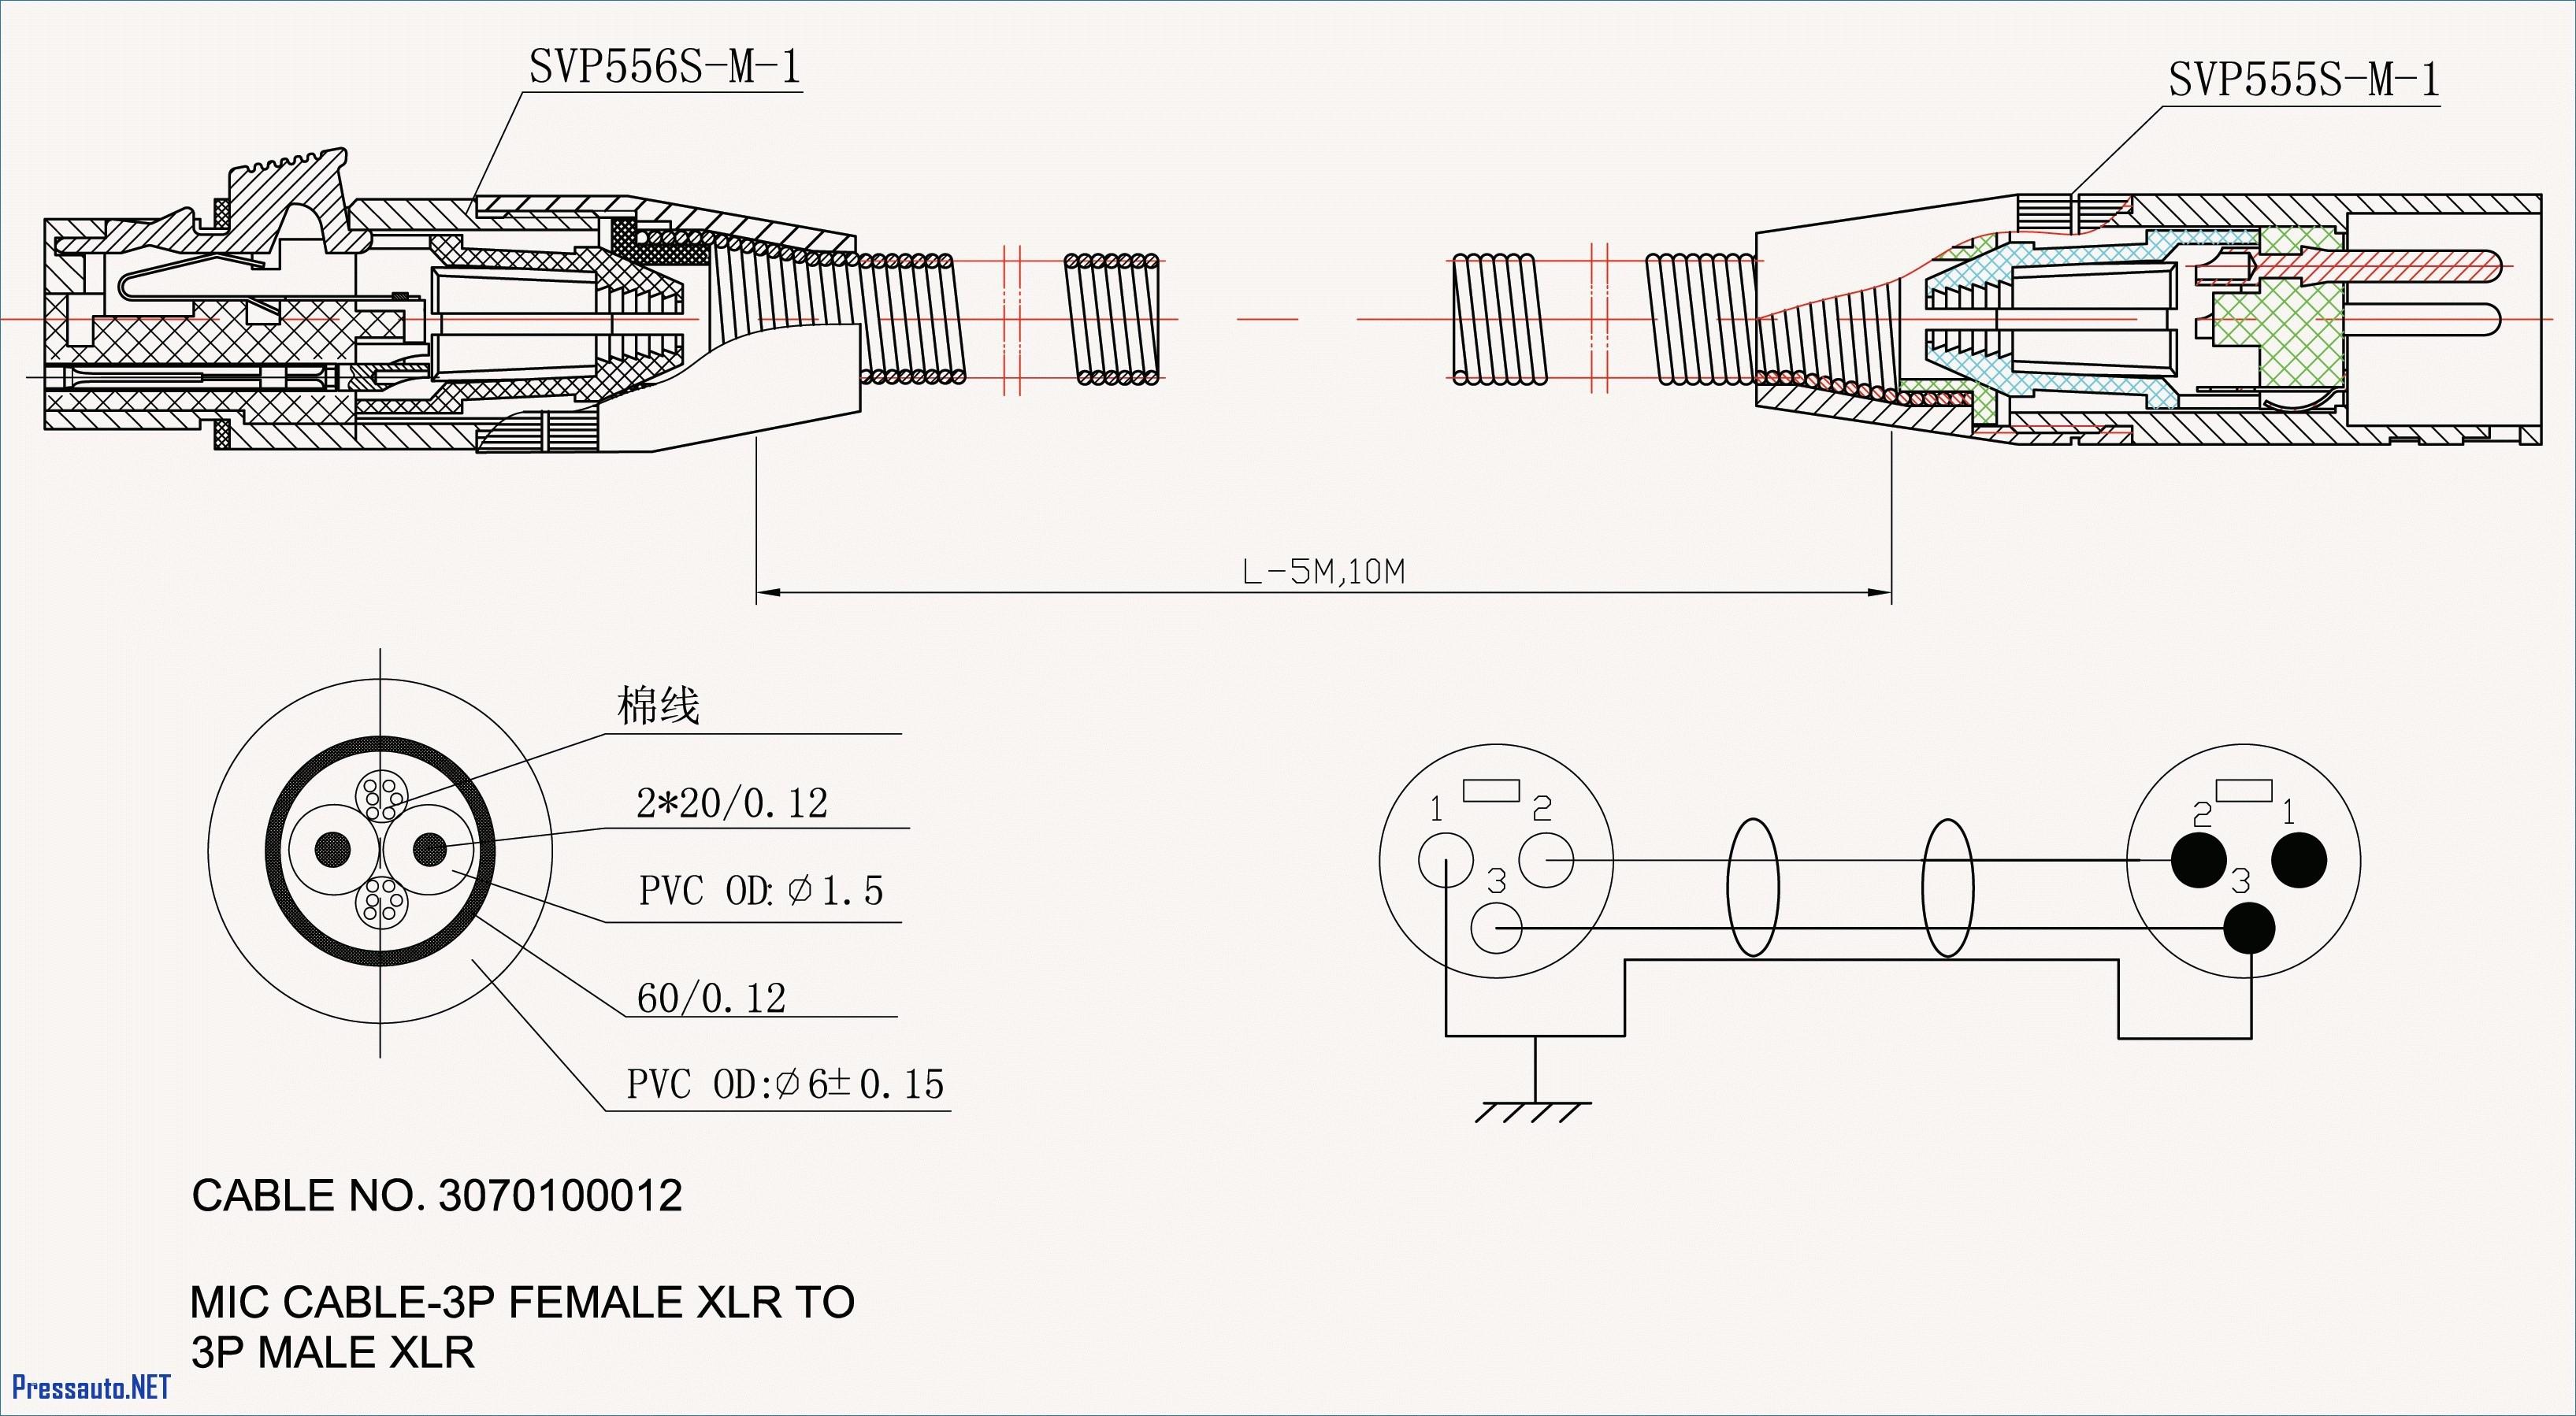 Honda Shadow 1100 Wiring Diagram Dot Wiring Diagram Experts Wiring Diagram • Of Honda Shadow 1100 Wiring Diagram